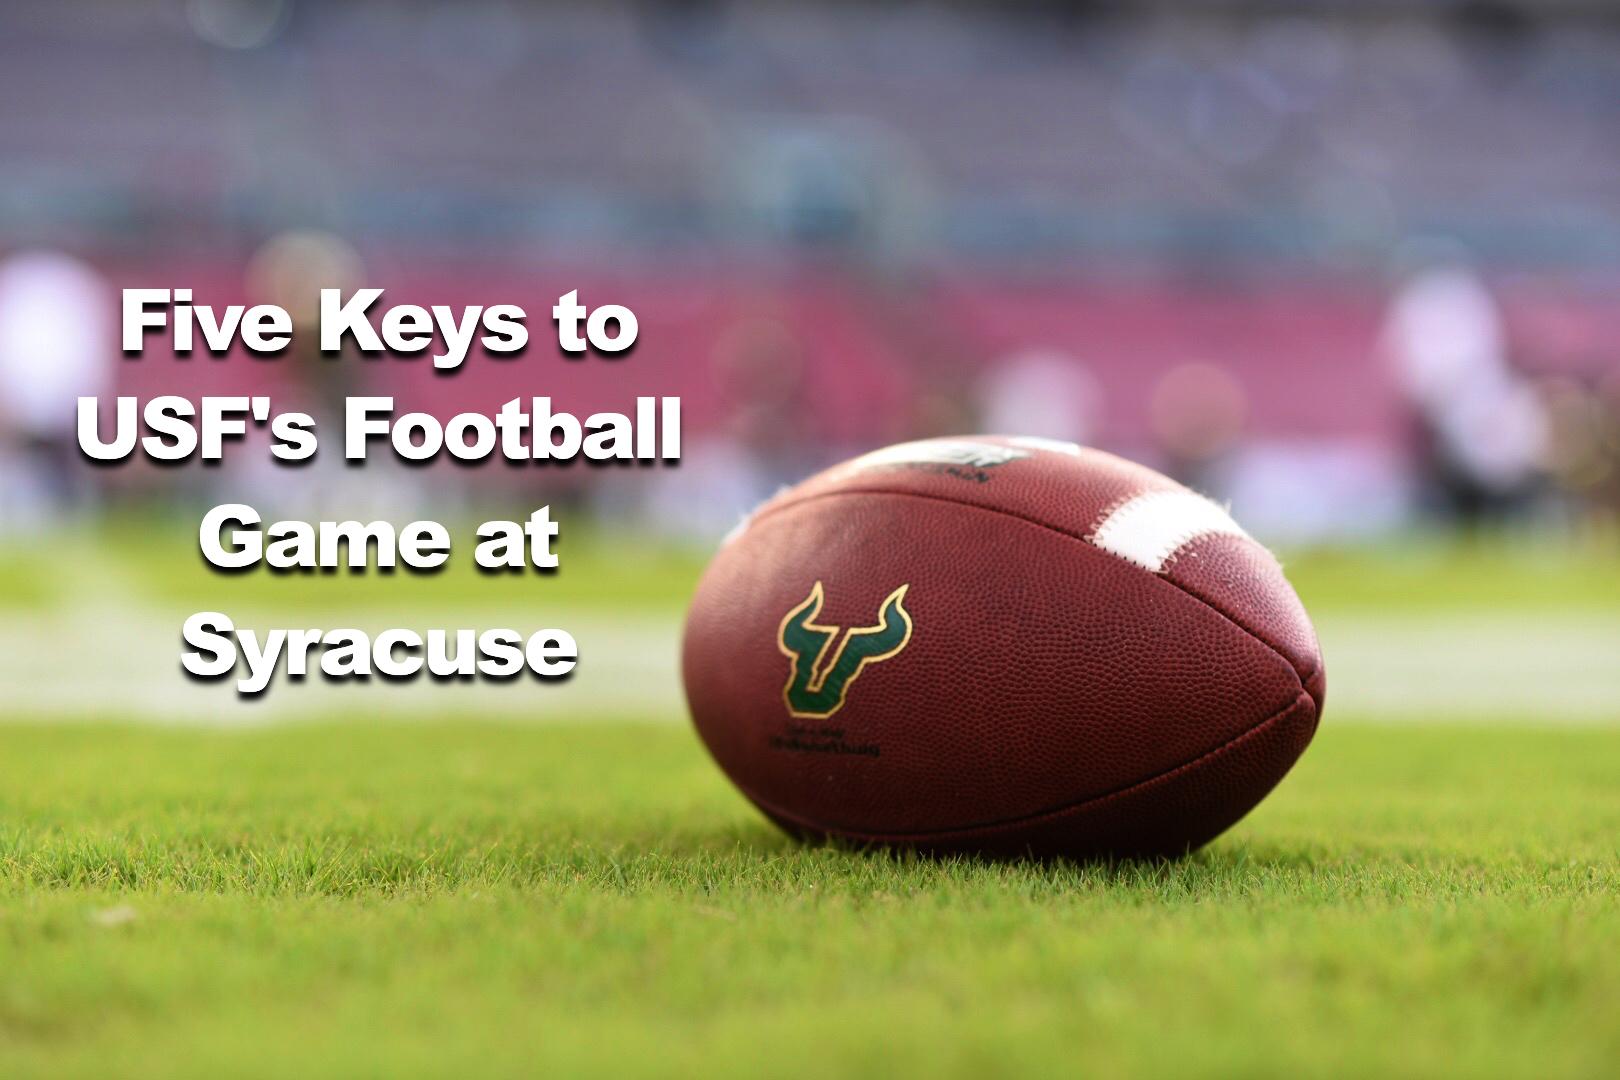 #BeatCuse - USF vs. Syracuse Five Keys to USF's Game at Syracuse by Matt Staton | SoFloBulls.com (1620x1080)